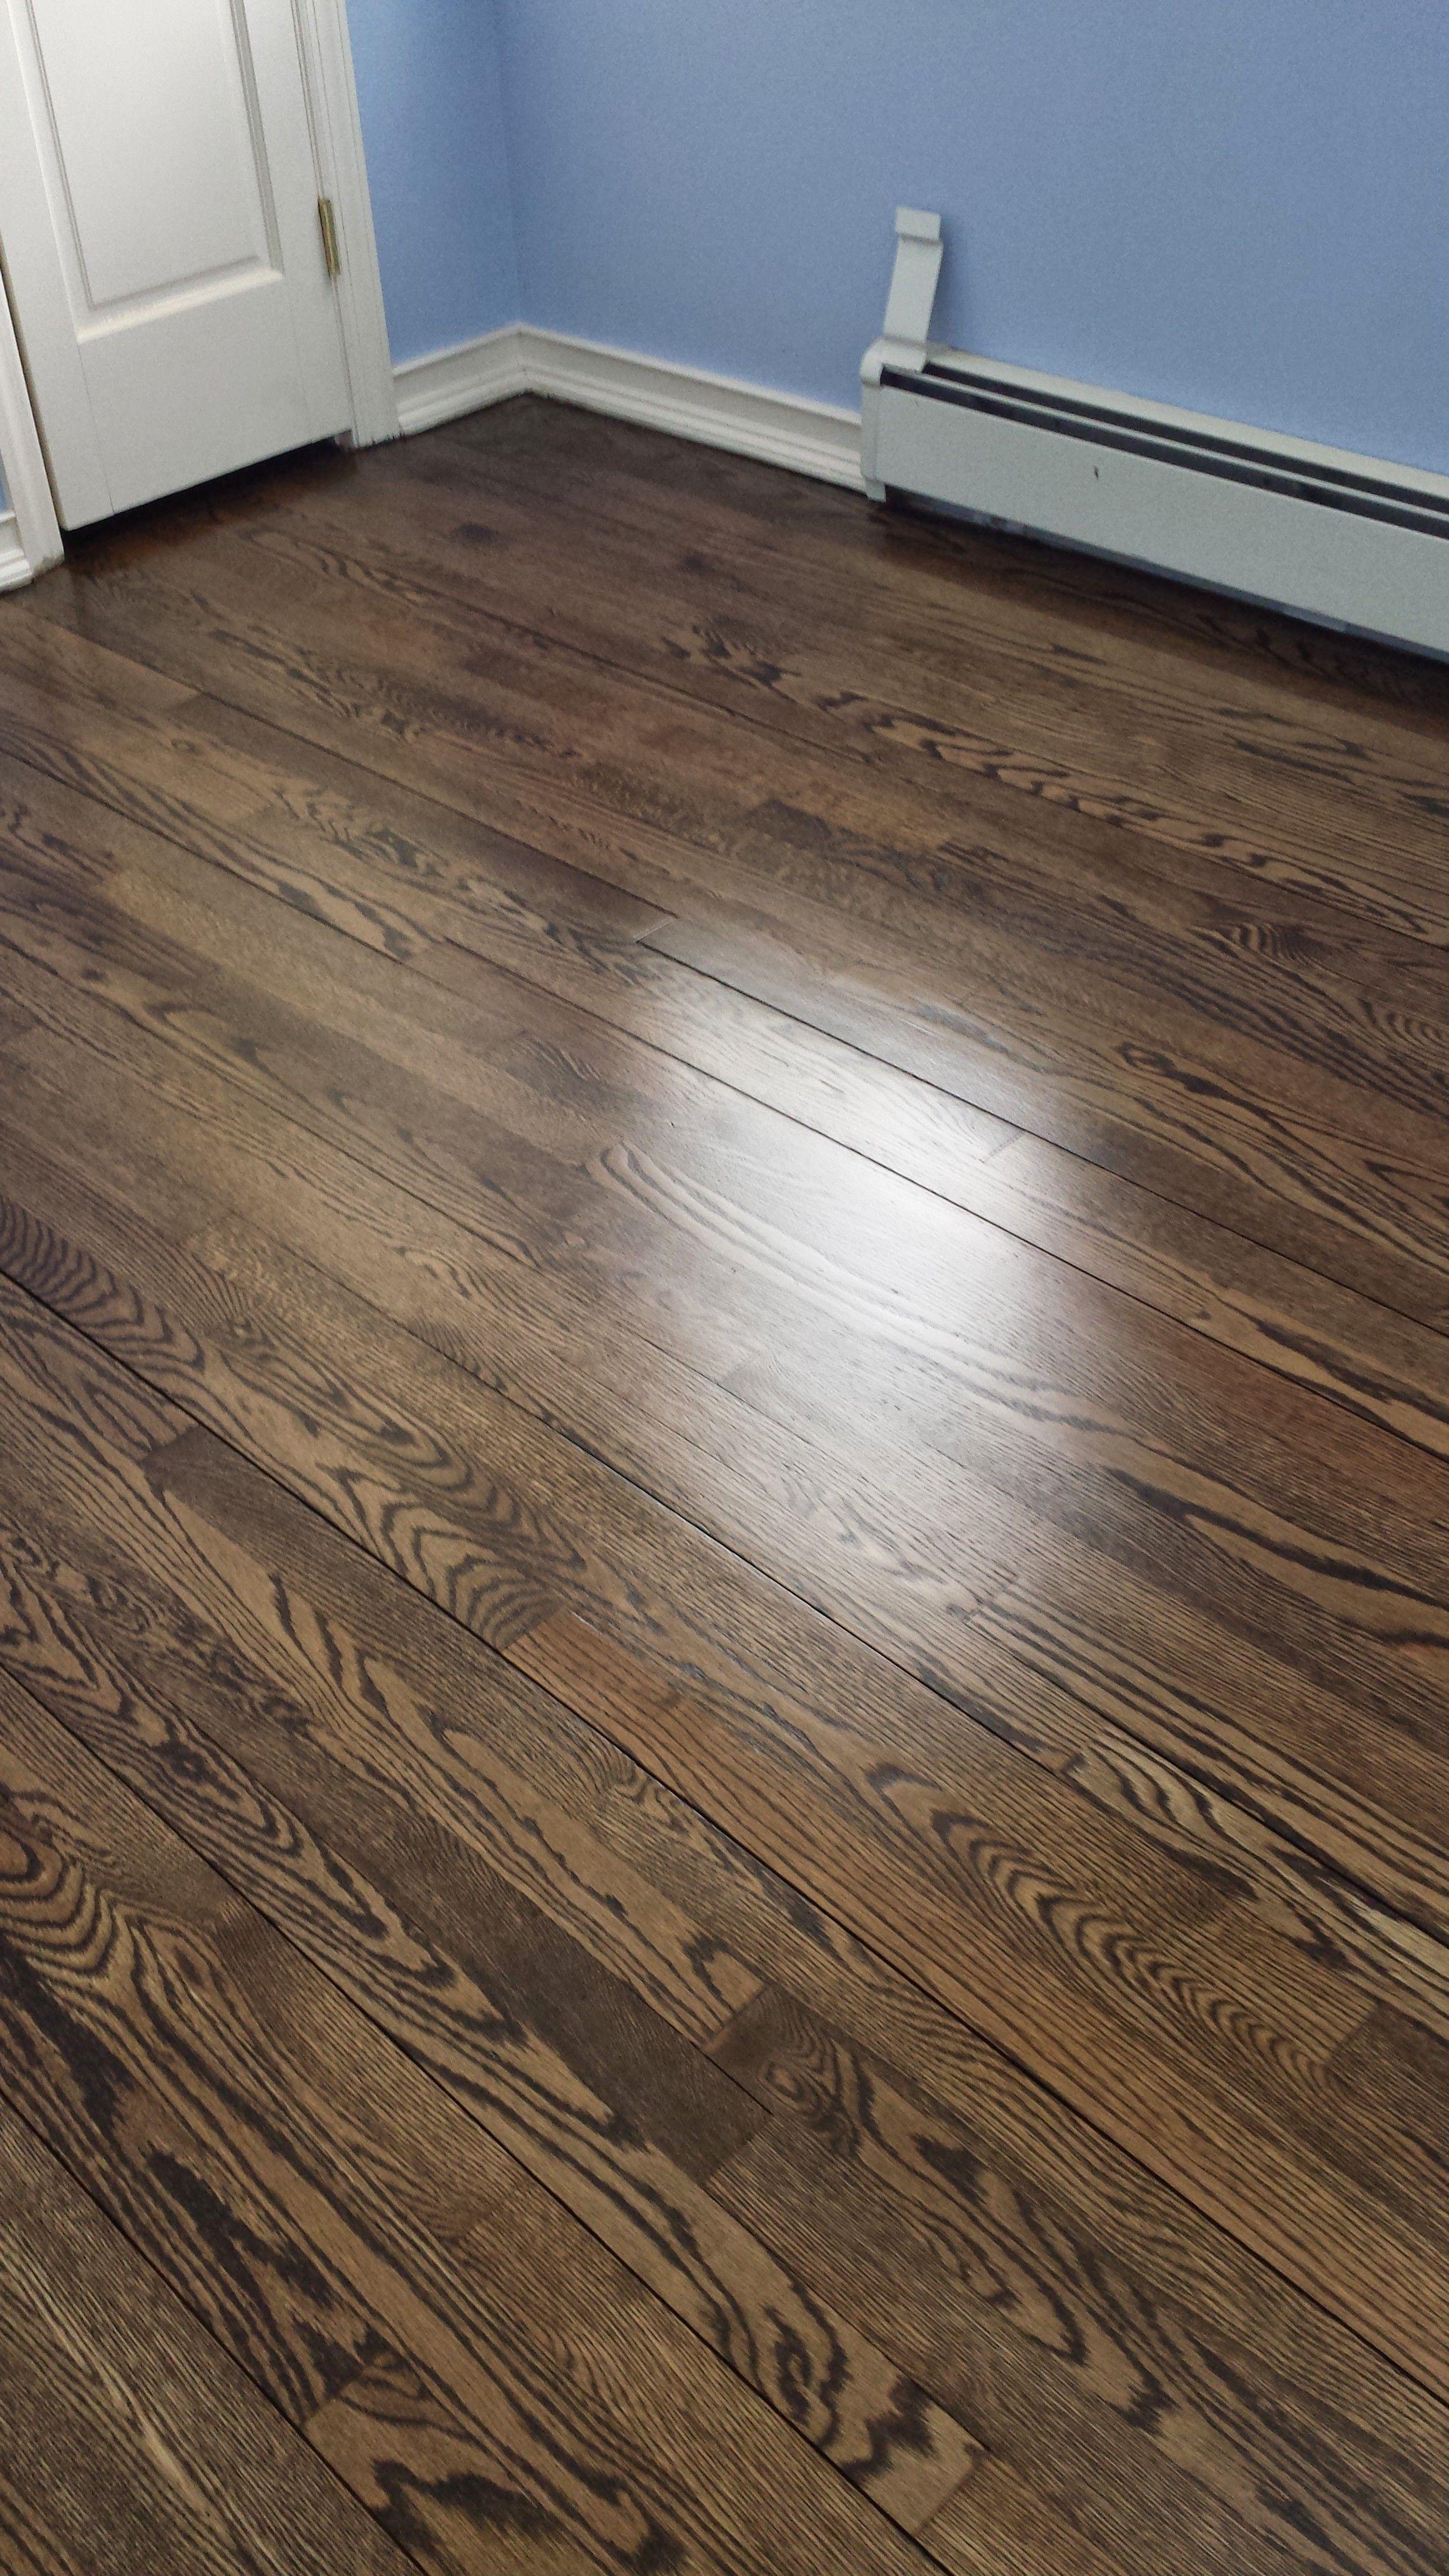 hardwood floor repair of hardwood floor repair floor plan ideas pertaining to 20 photos of the hardwood floor repair